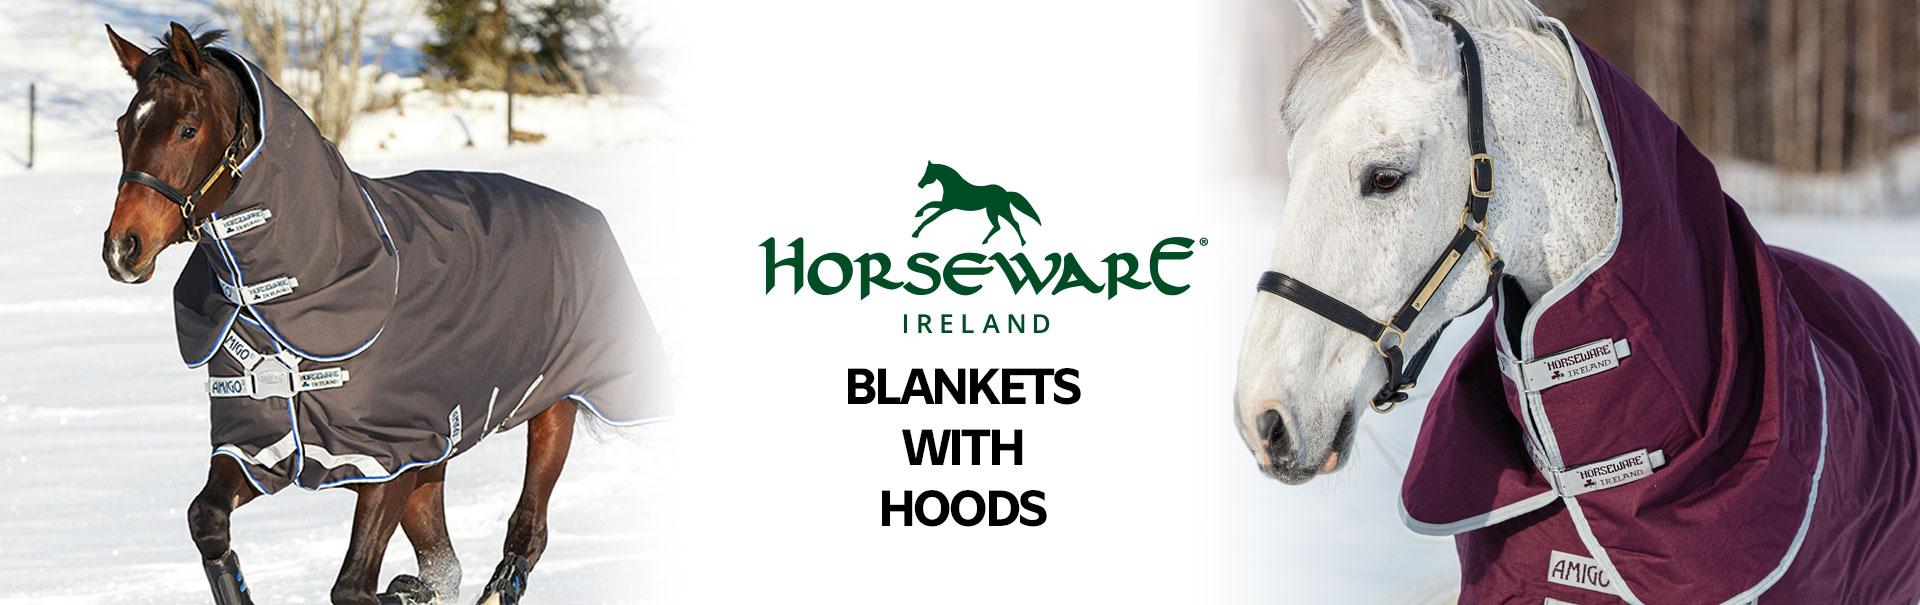 Horseware Blankets with Hoods